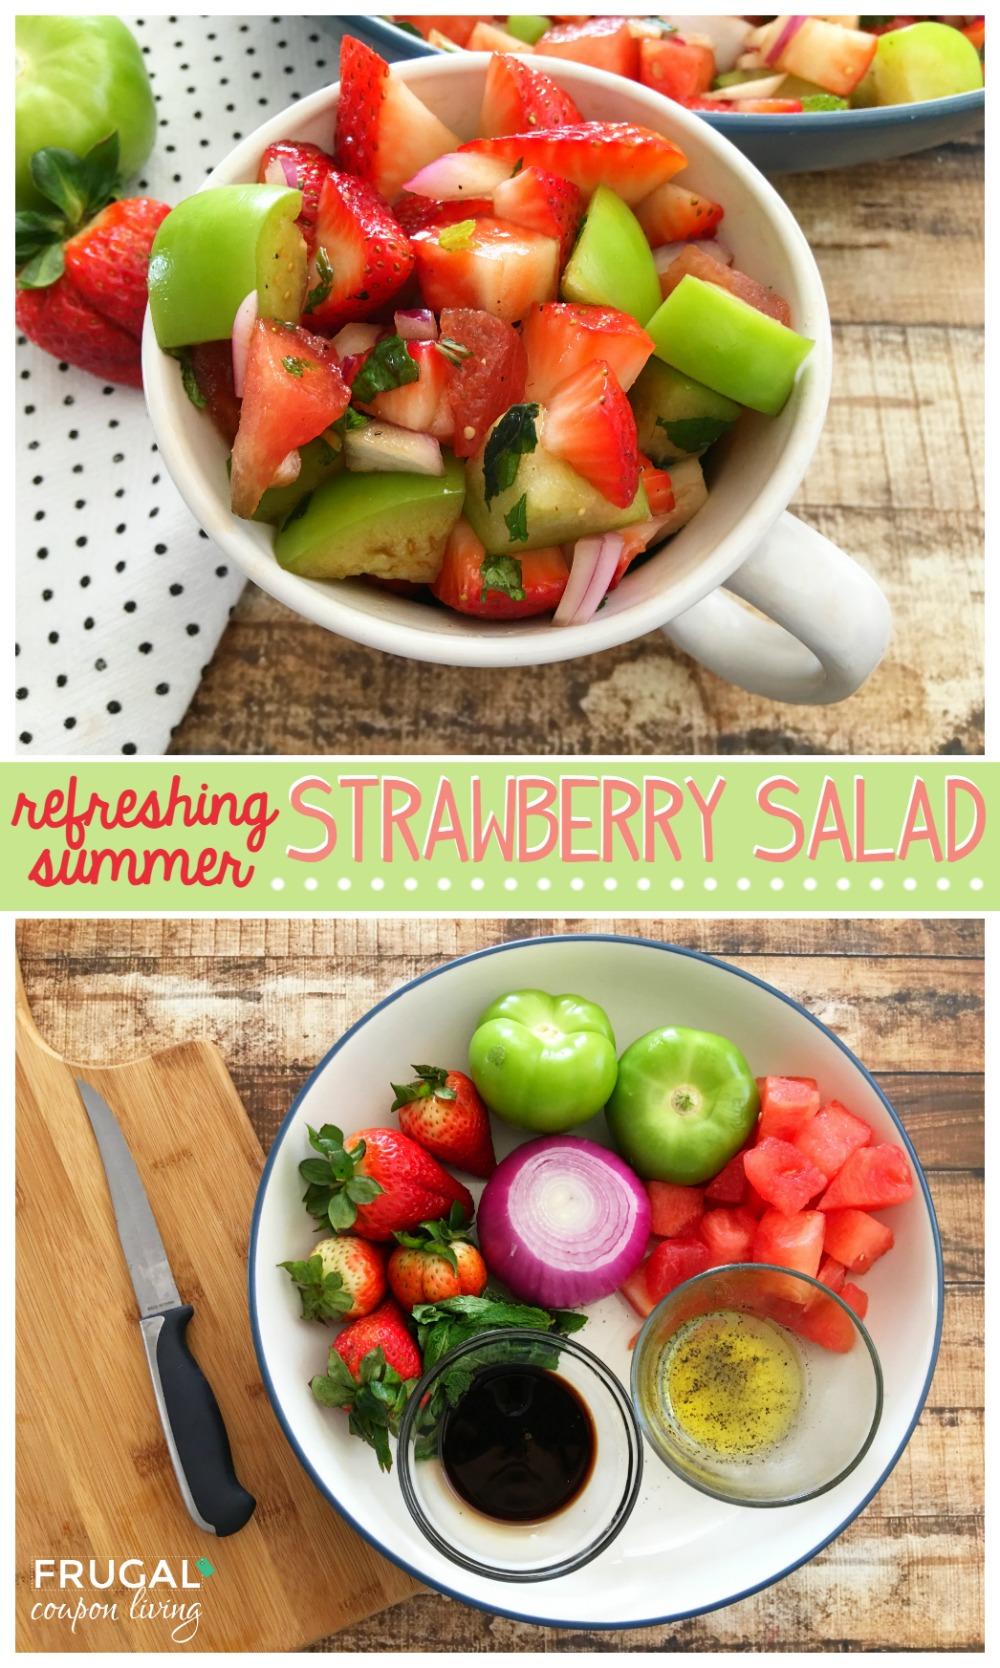 summer-strawberry-salad-short-frugal-coupon-living